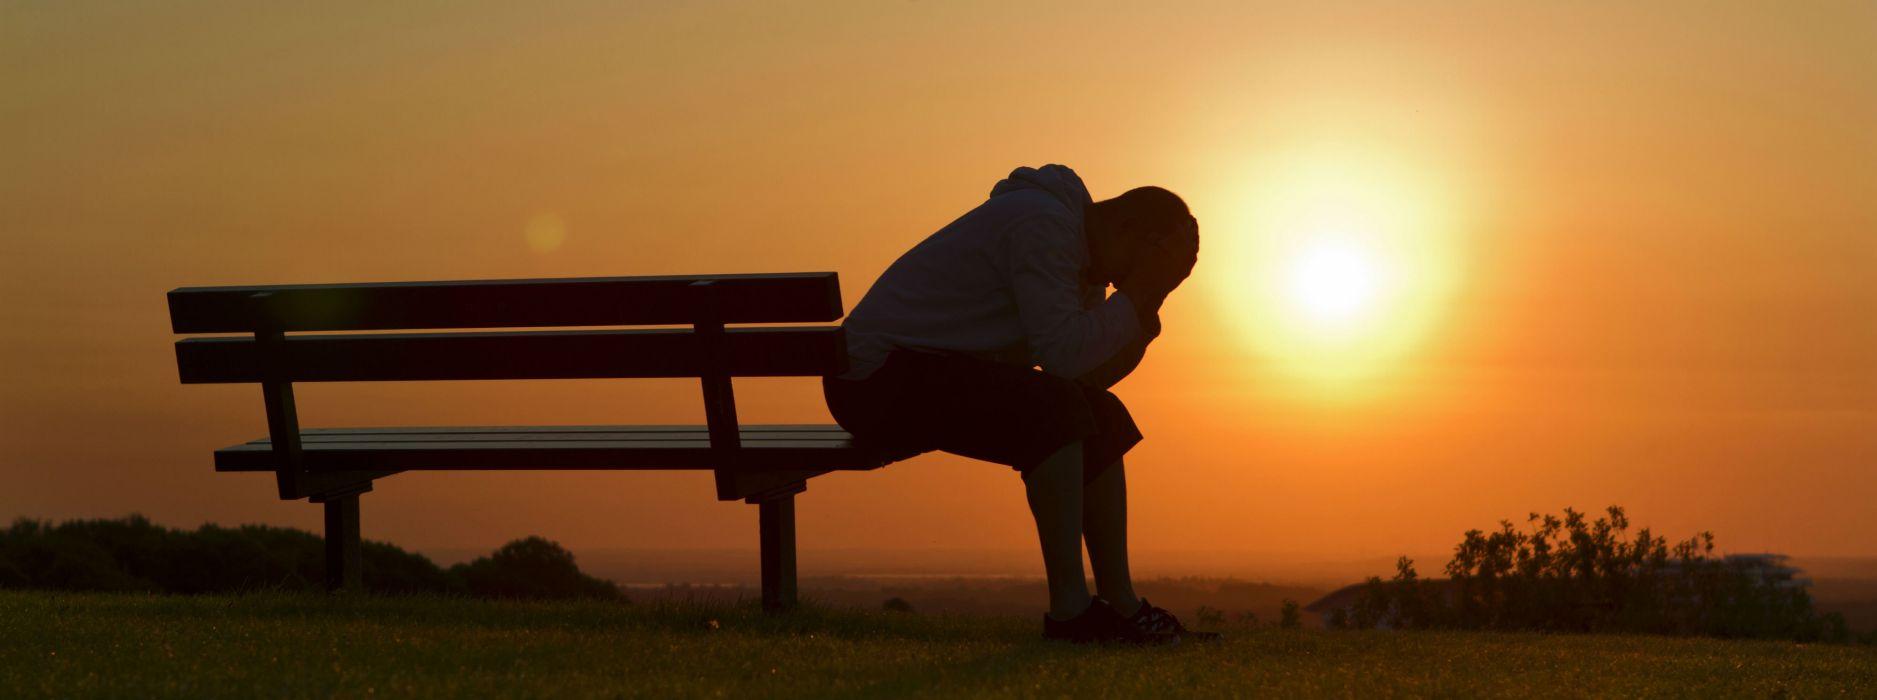 Sad Alone Girl Hd Wallpaper Download Sad Mood Sorrow Dark People Love Sunset Wallpaper